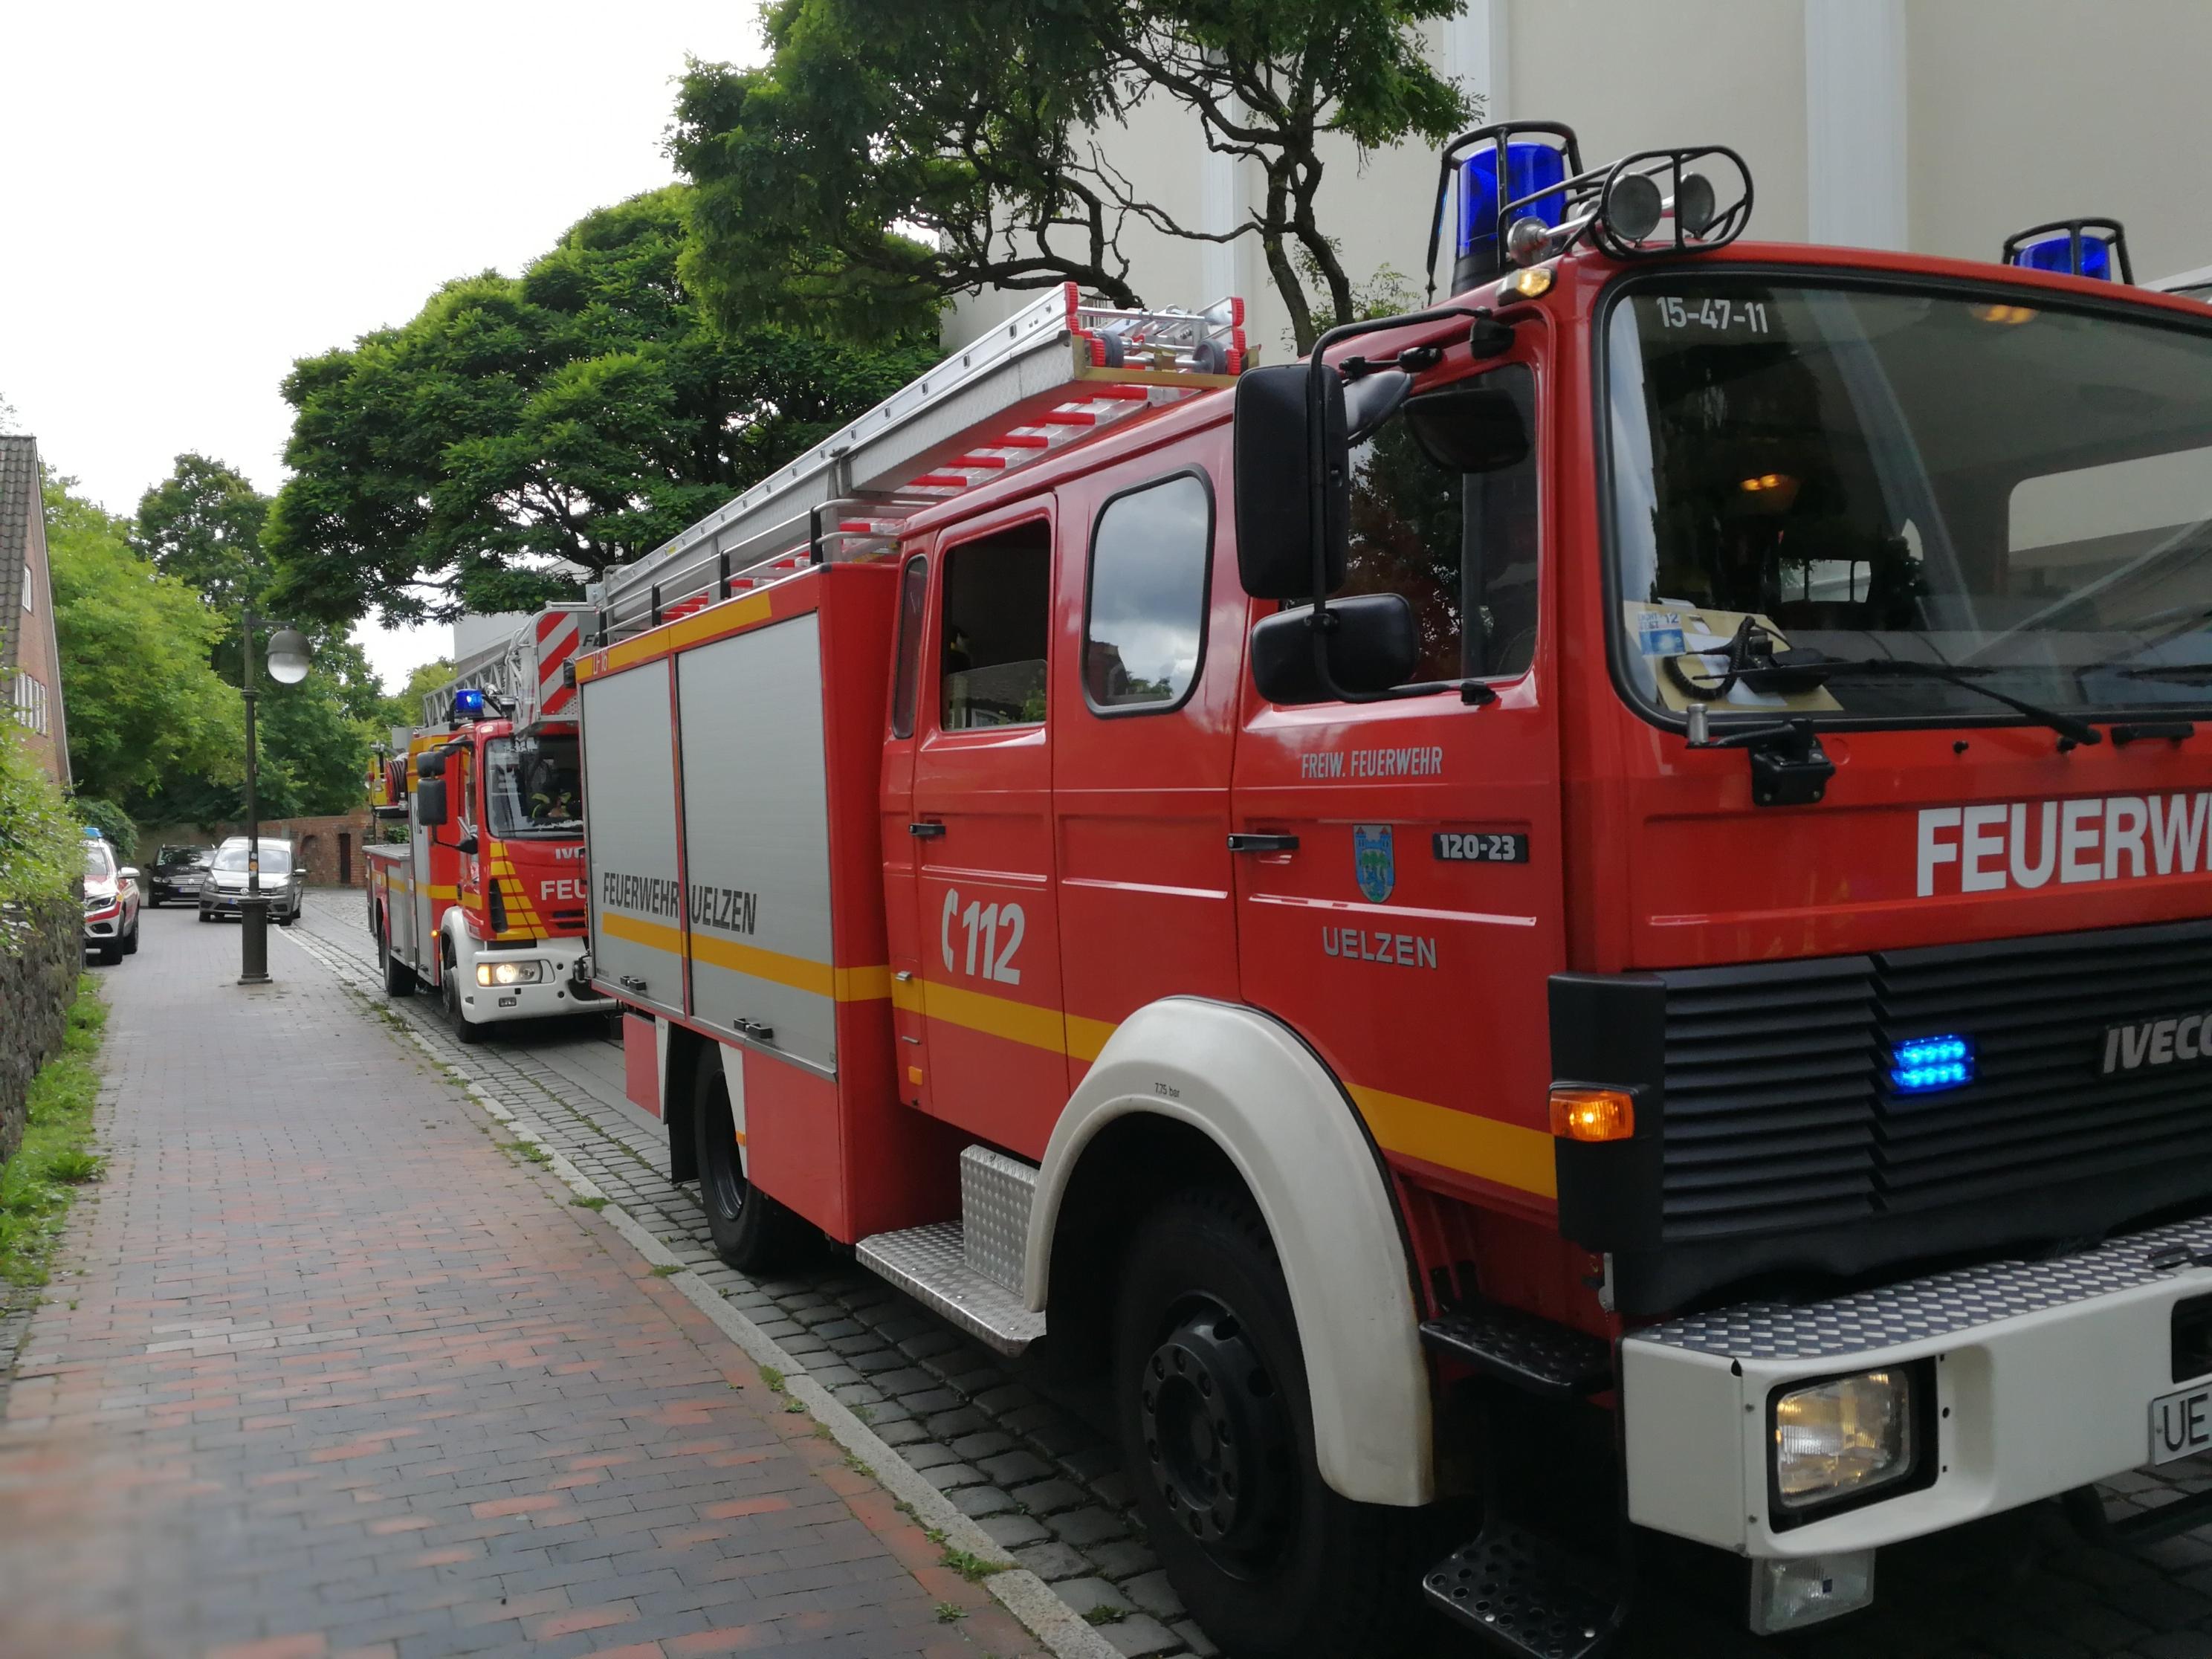 225. BMA - Alarm